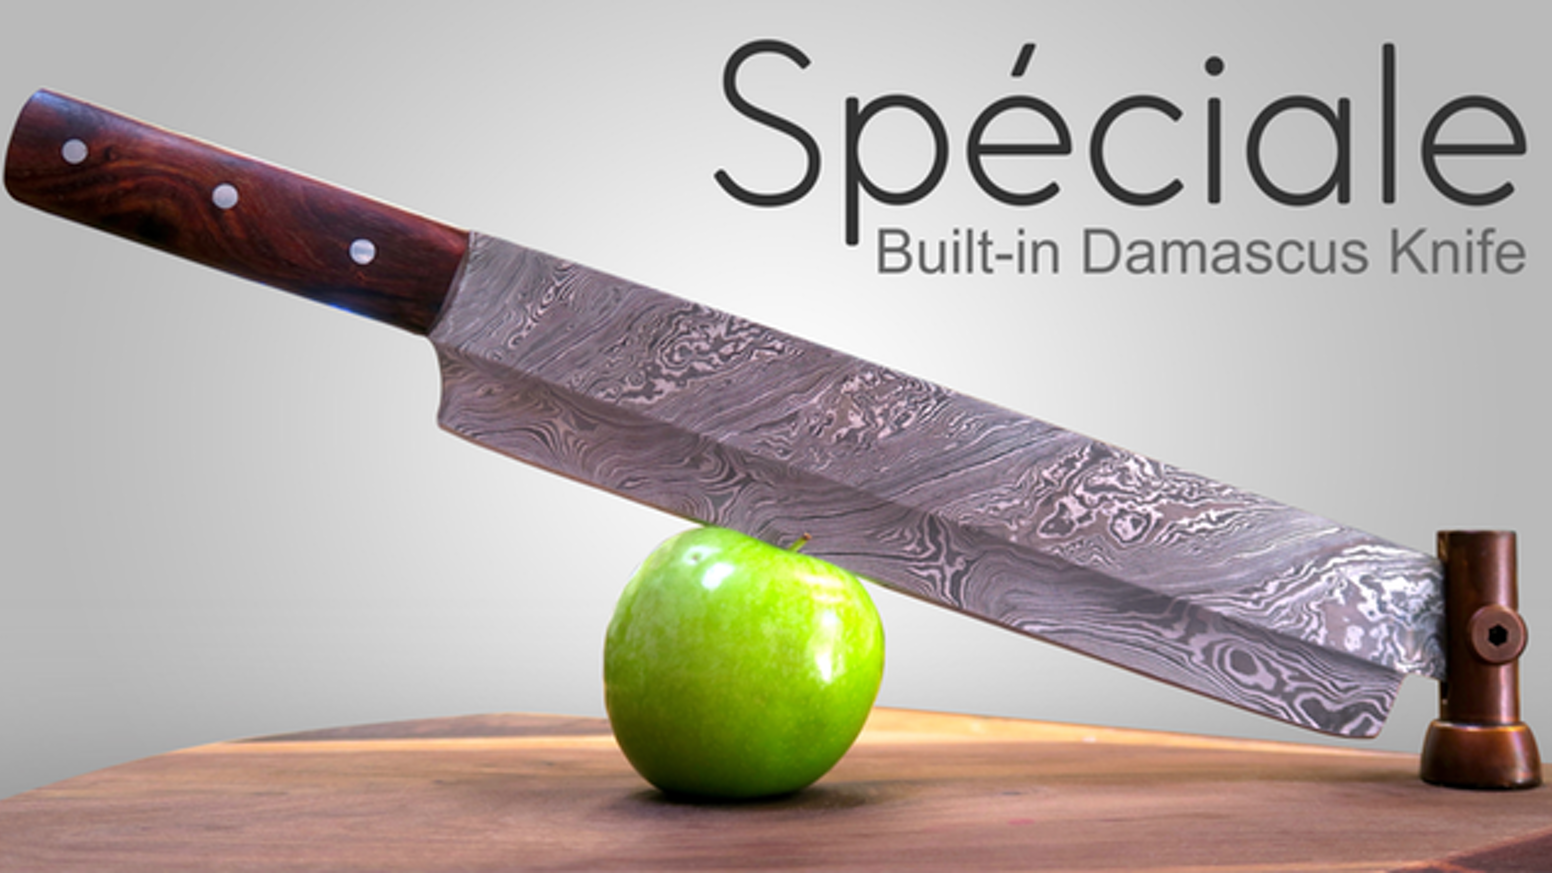 Spéciale | Built-in Damascus Knife by Spéciale — Kickstarter